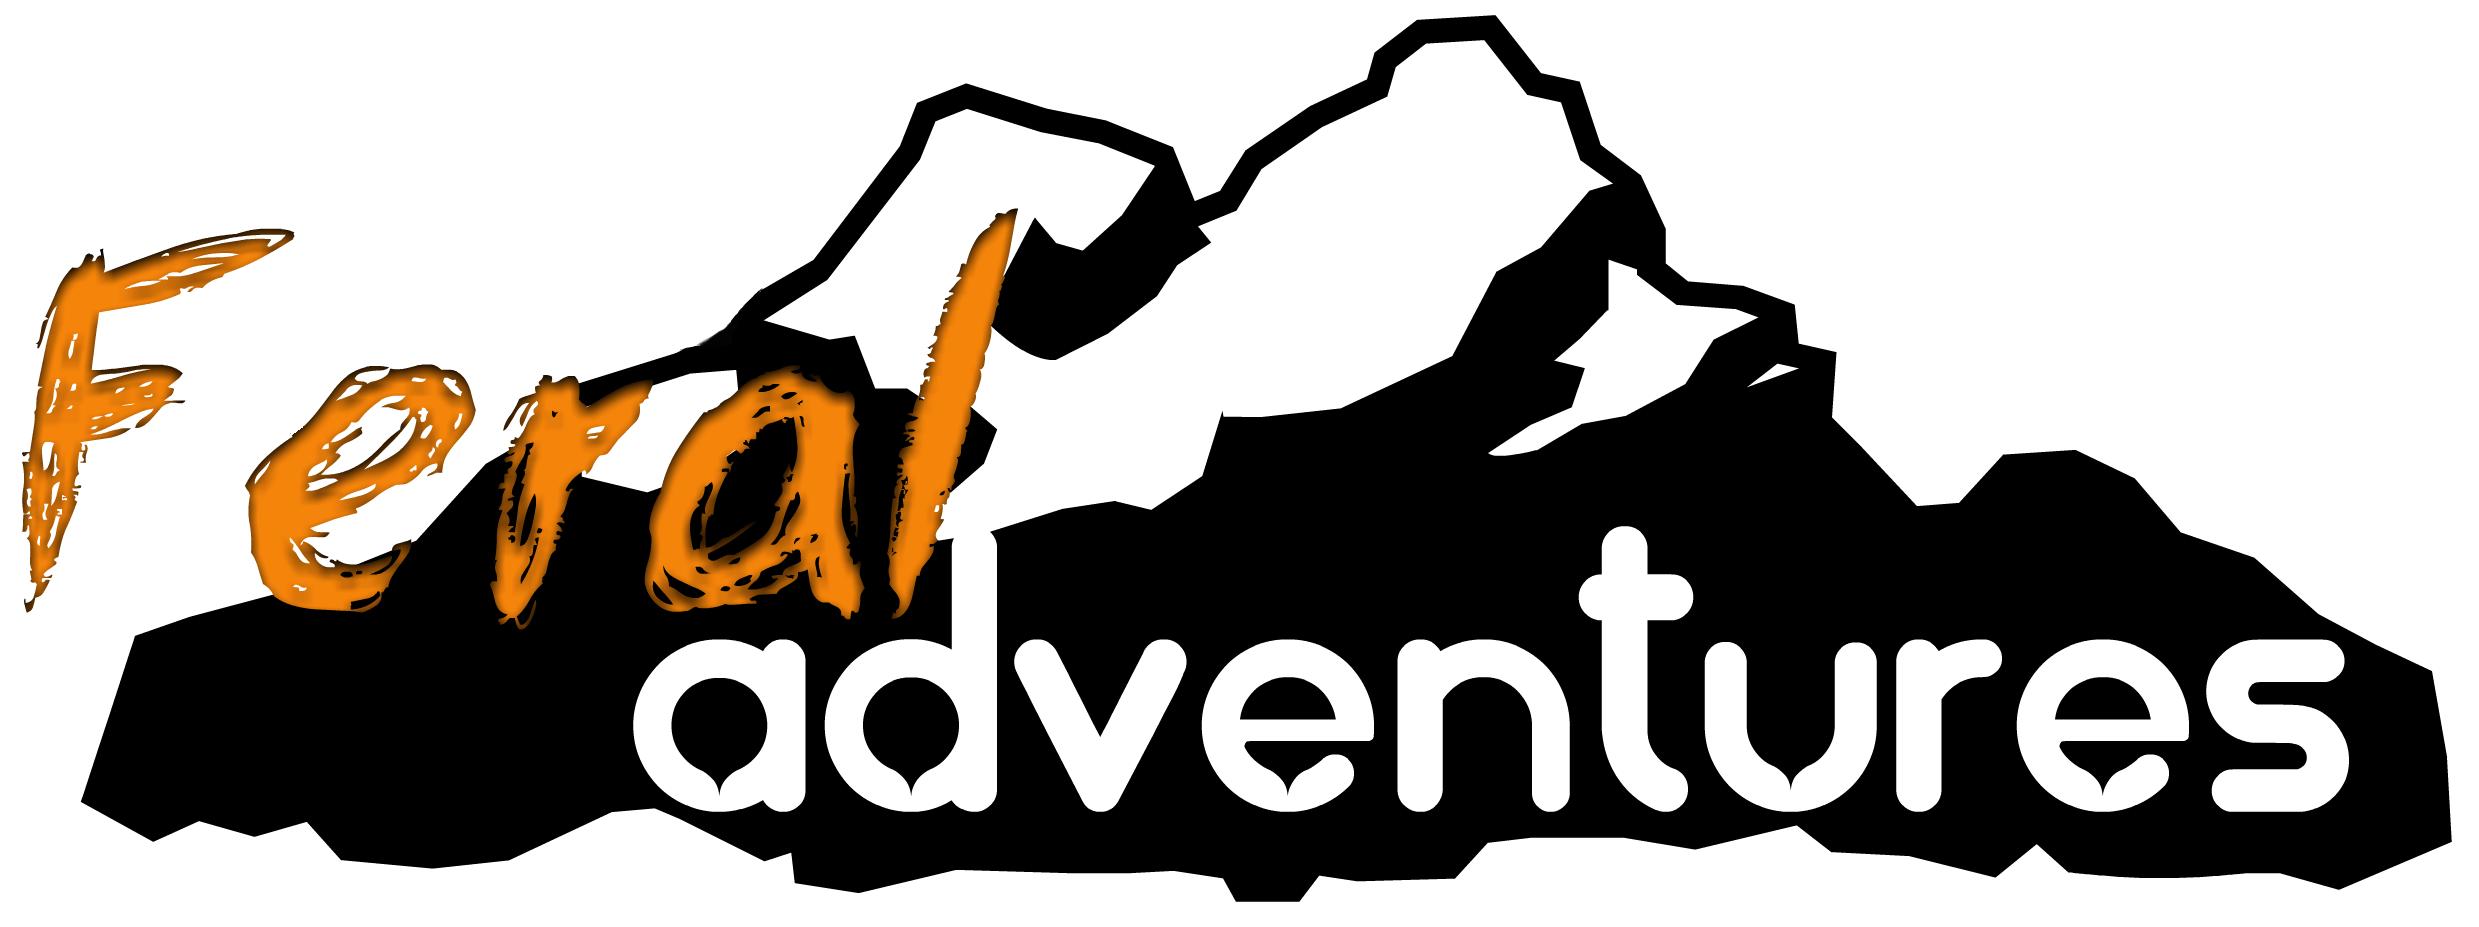 Feral Adventures